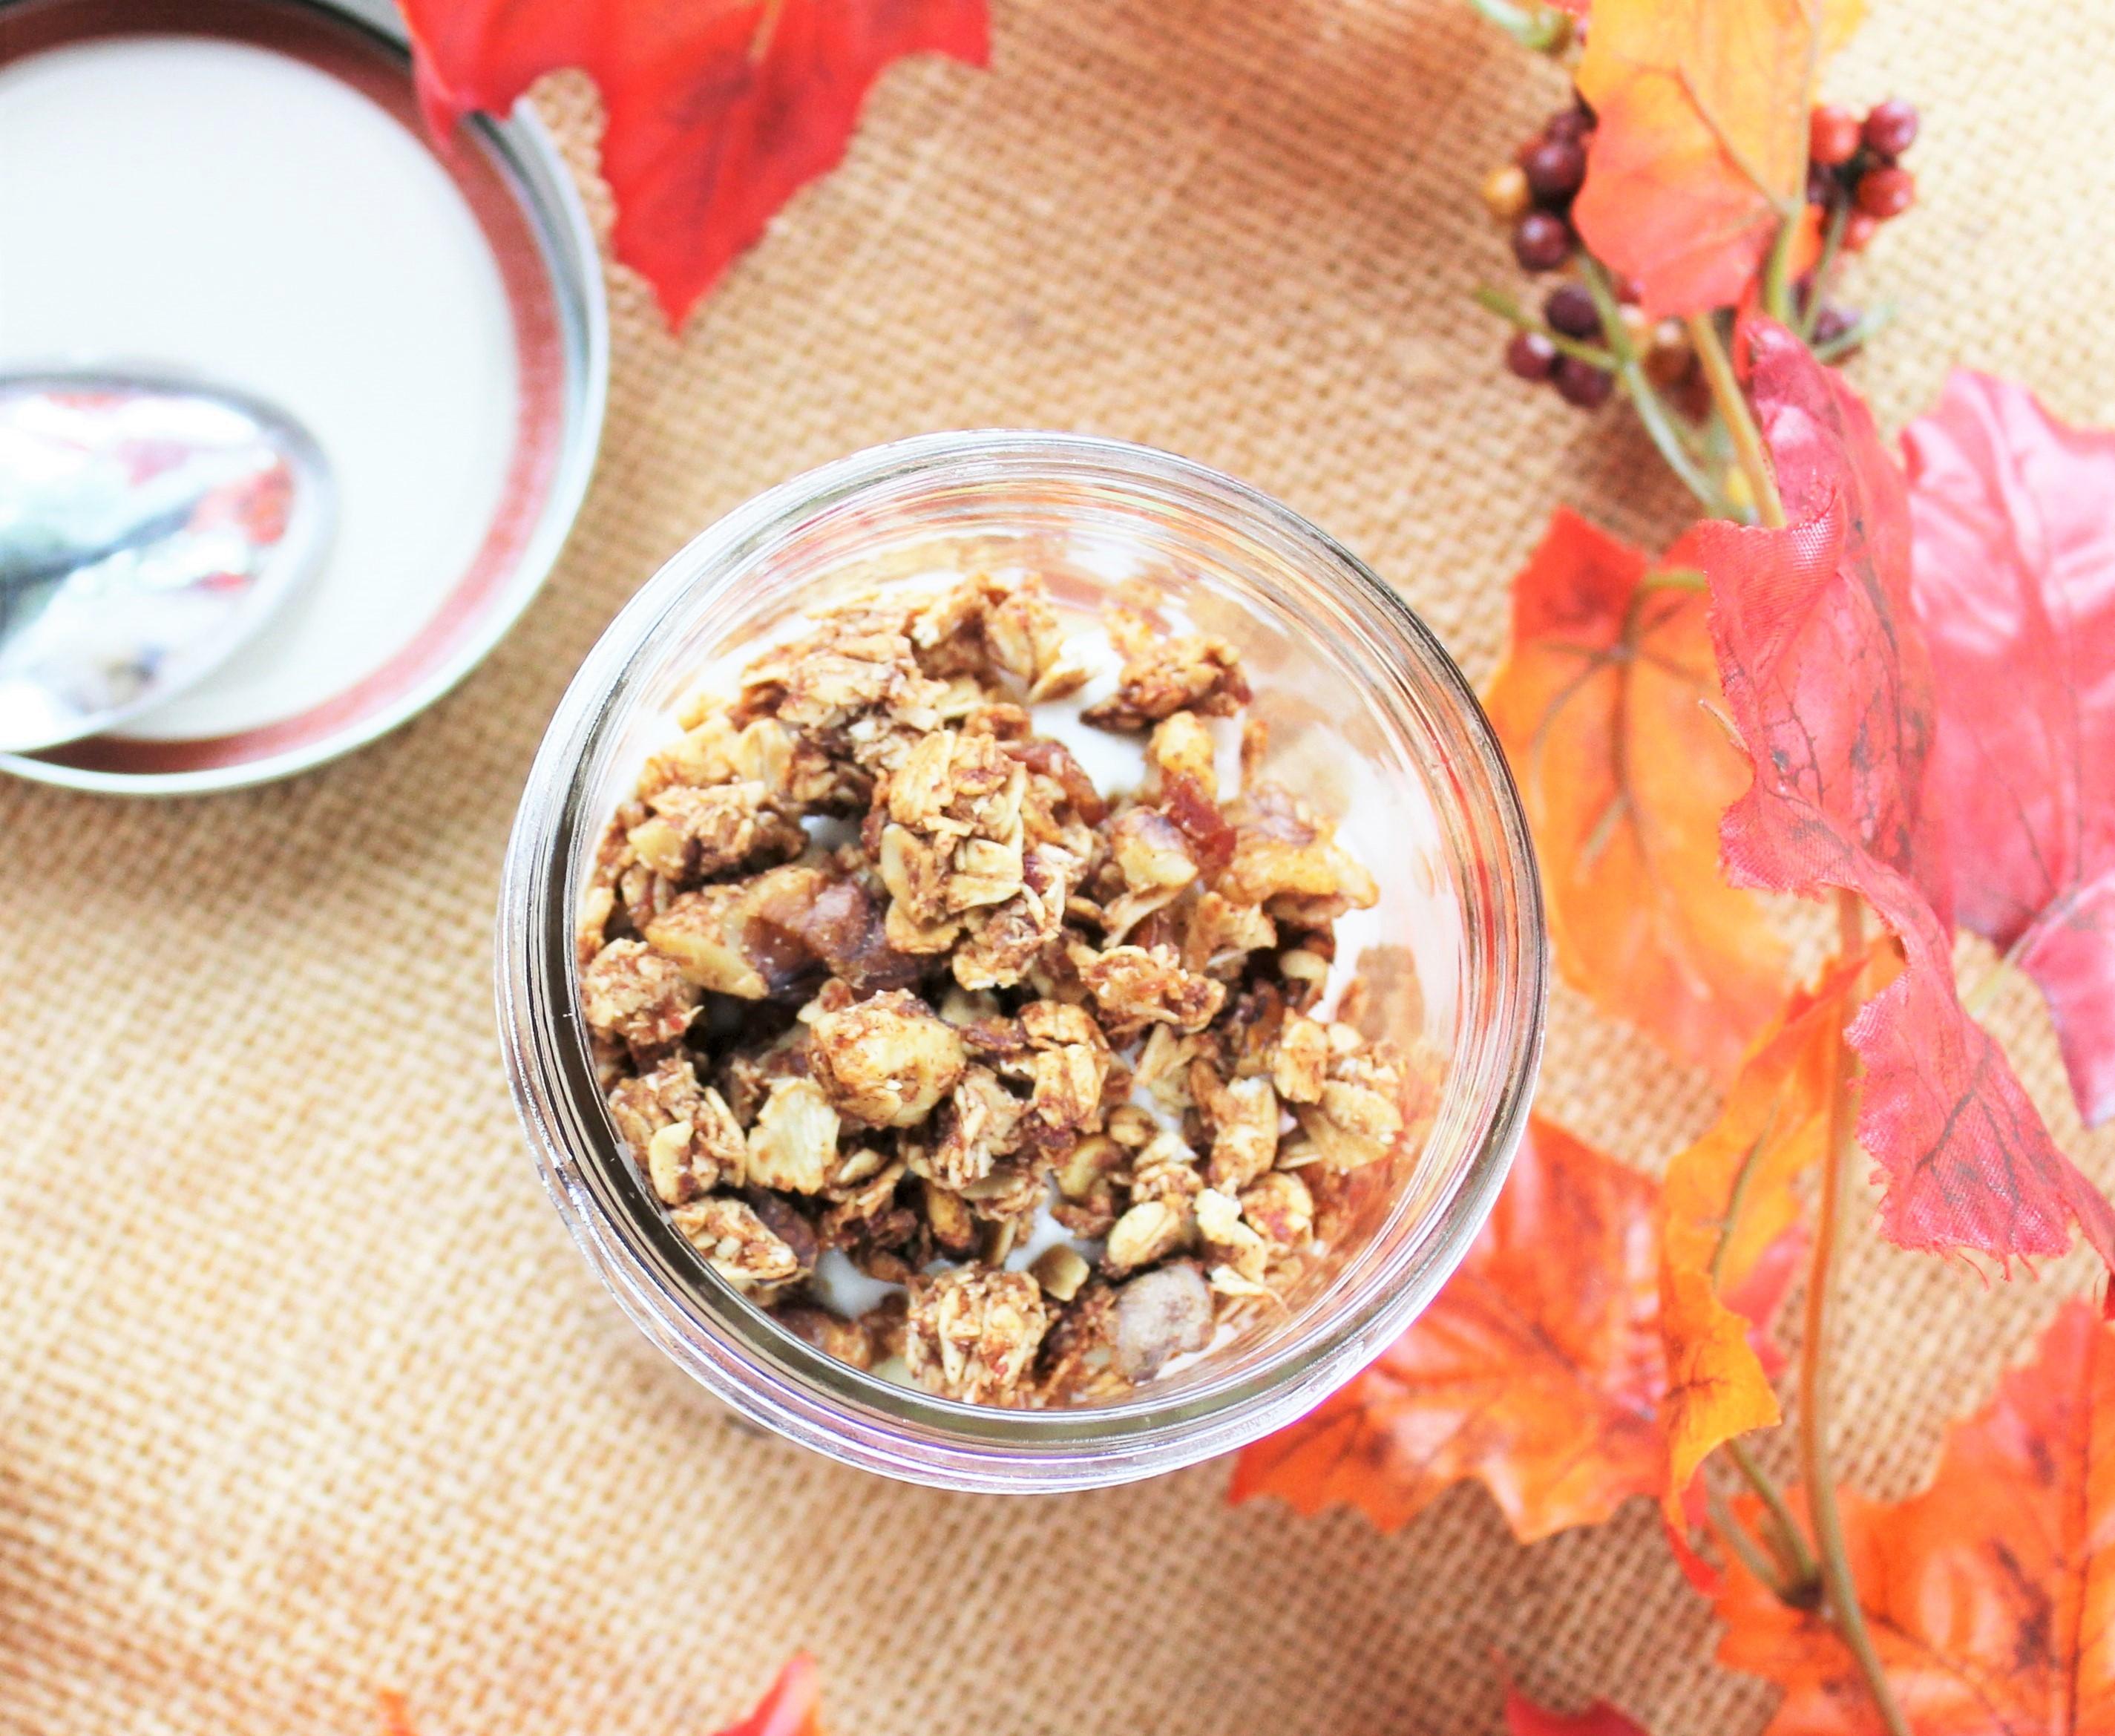 Yogurt Breakfast Parfait with Diced Apple and Homemade Cinnamon, Honey, and Walnut Granola 3